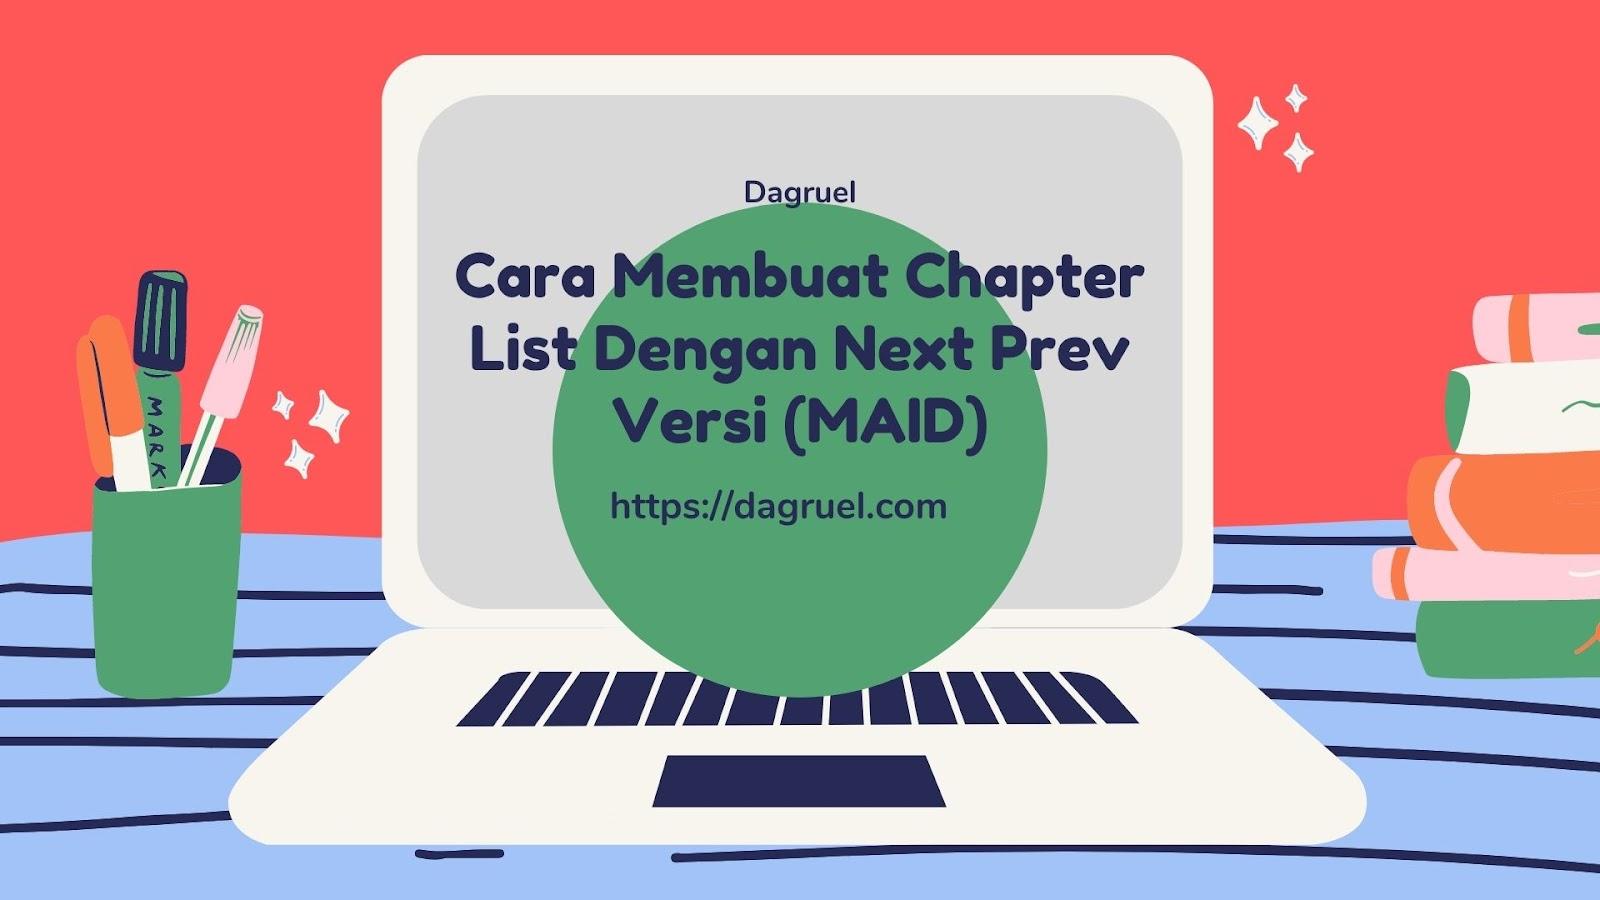 Chapter List Dengan Next Prev Versi (MAID)